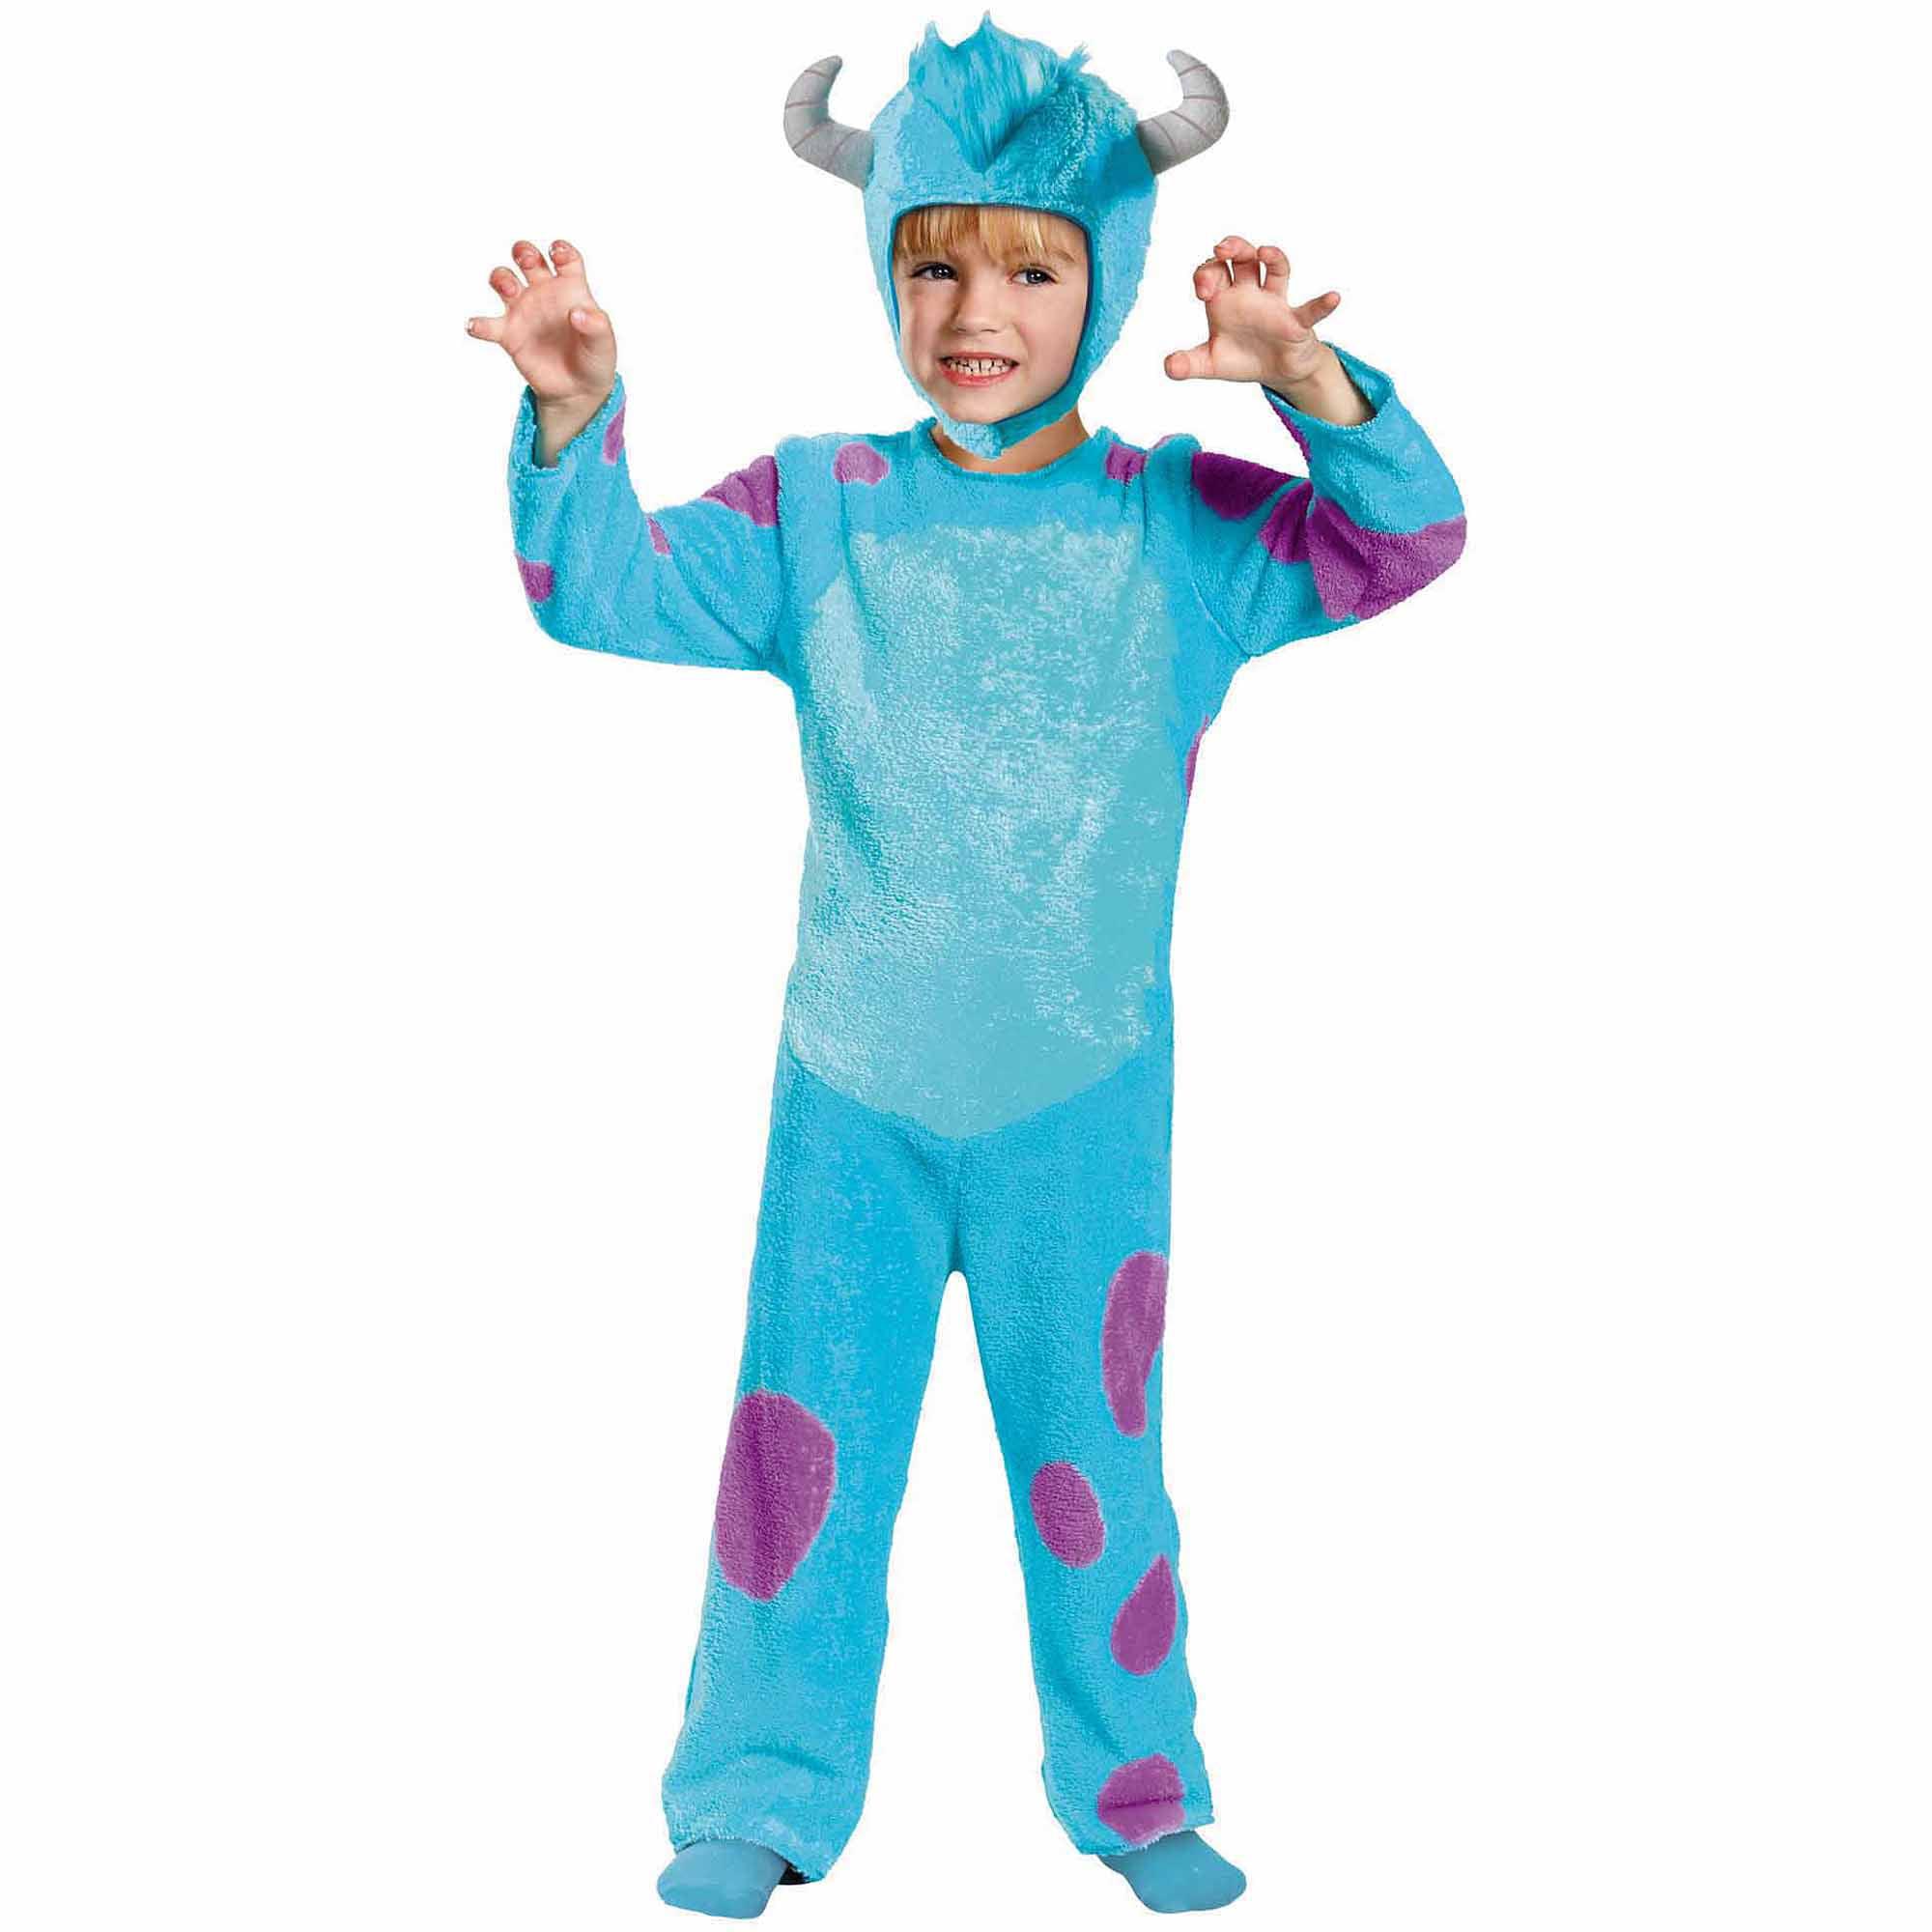 banana adult costume walmartcom - Utah Halloween Stores